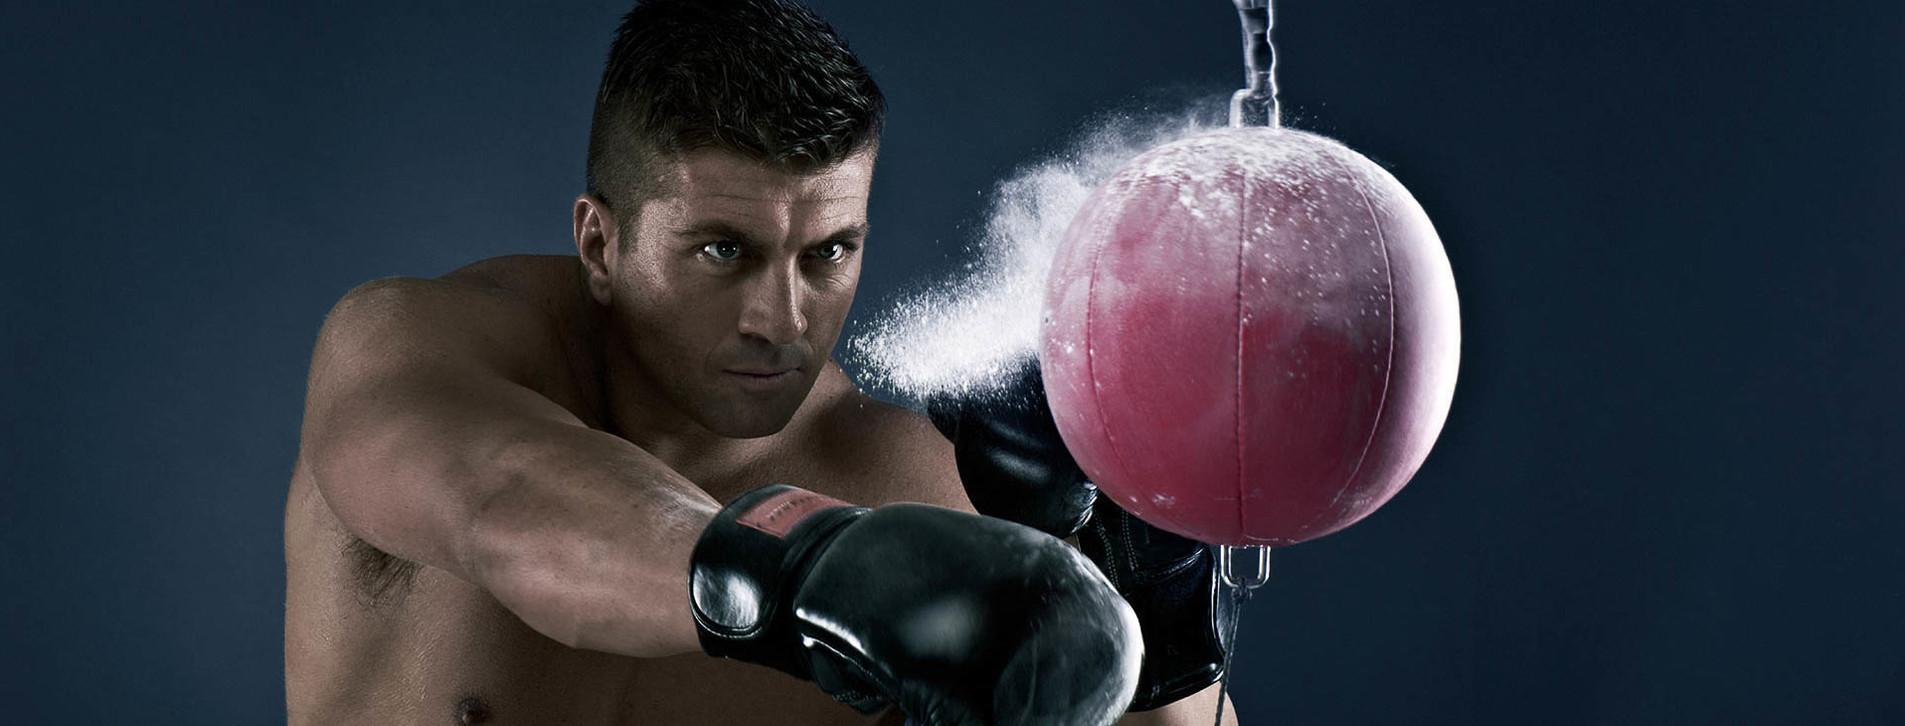 Фото 1 - Курс бокса